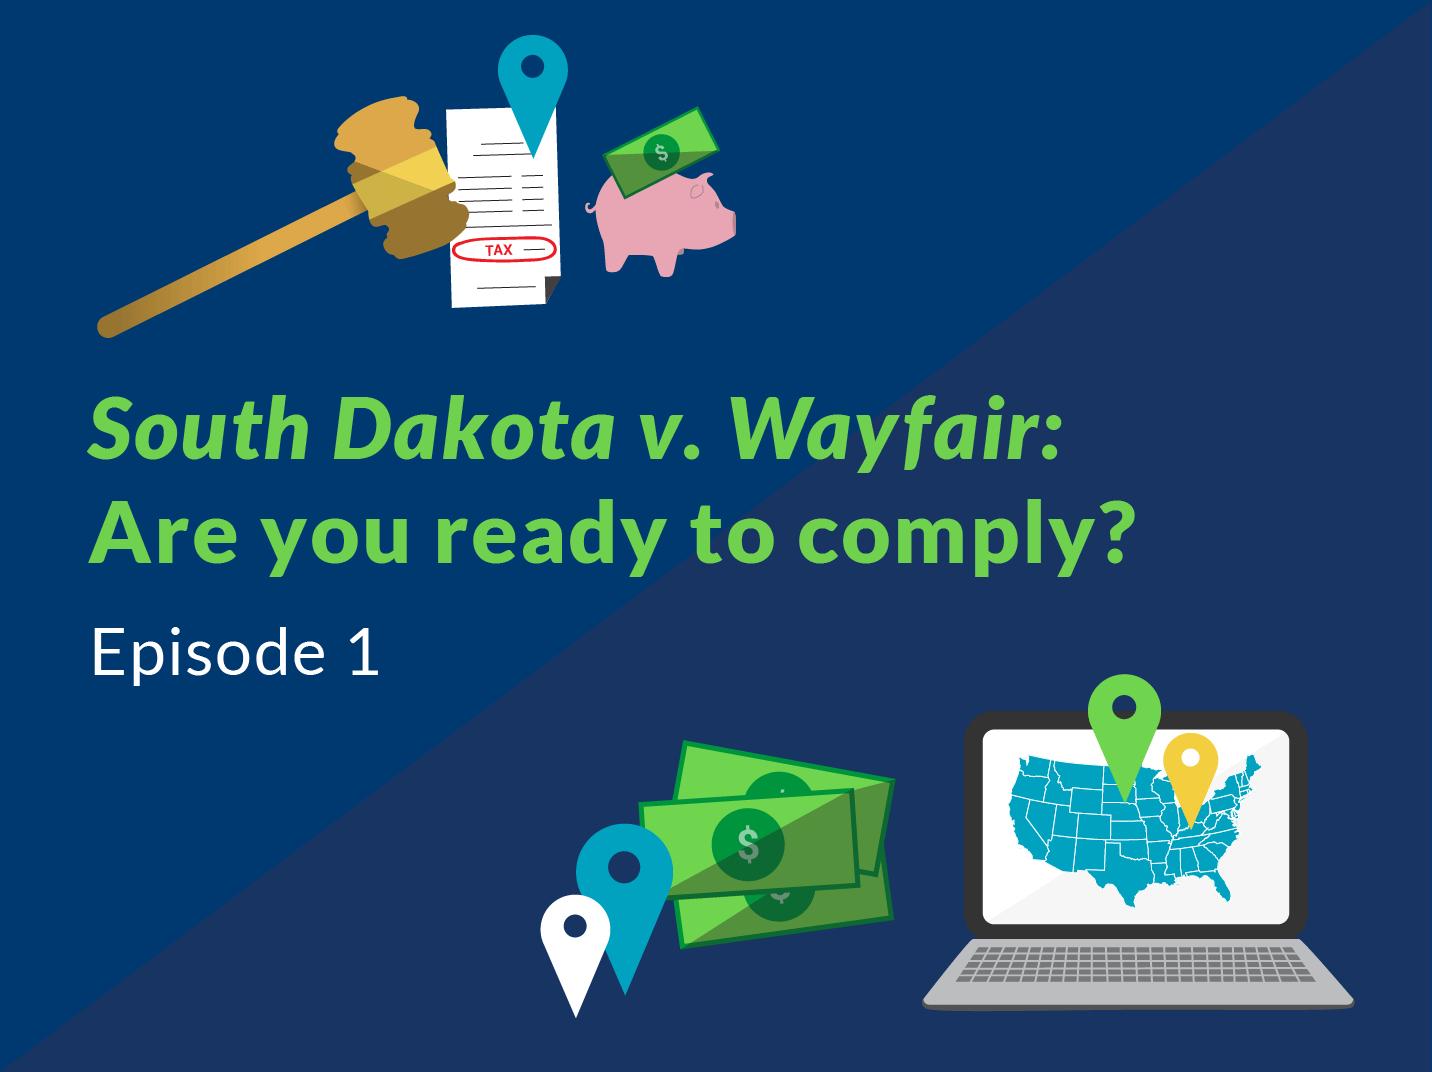 Are you ready to comply South Dakota v. Wayfair?